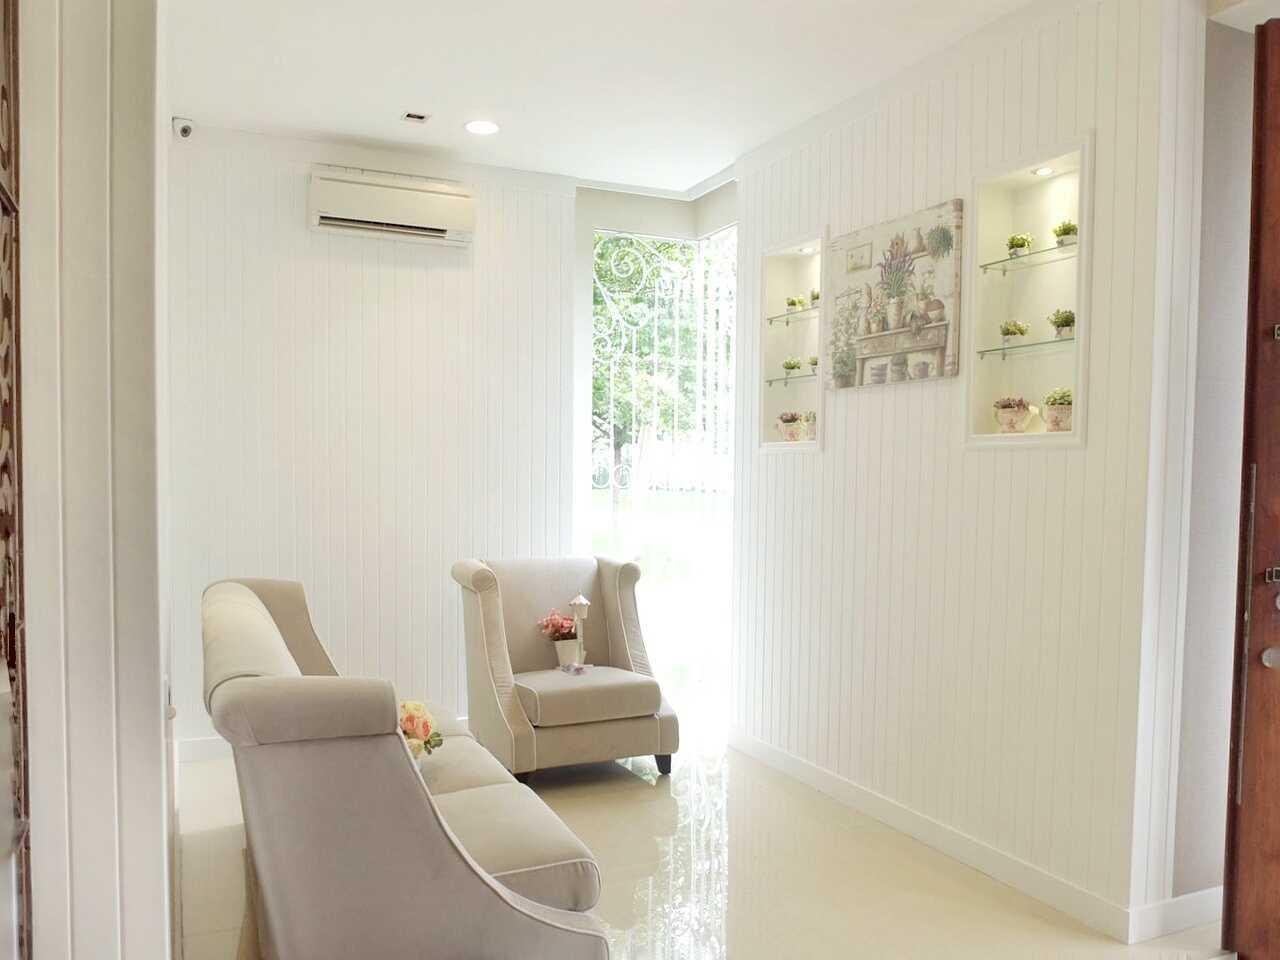 7Design Architect Mrs. D House Citrasun, Yogjakarta Citrasun, Yogjakarta Foyer Klasik 18702